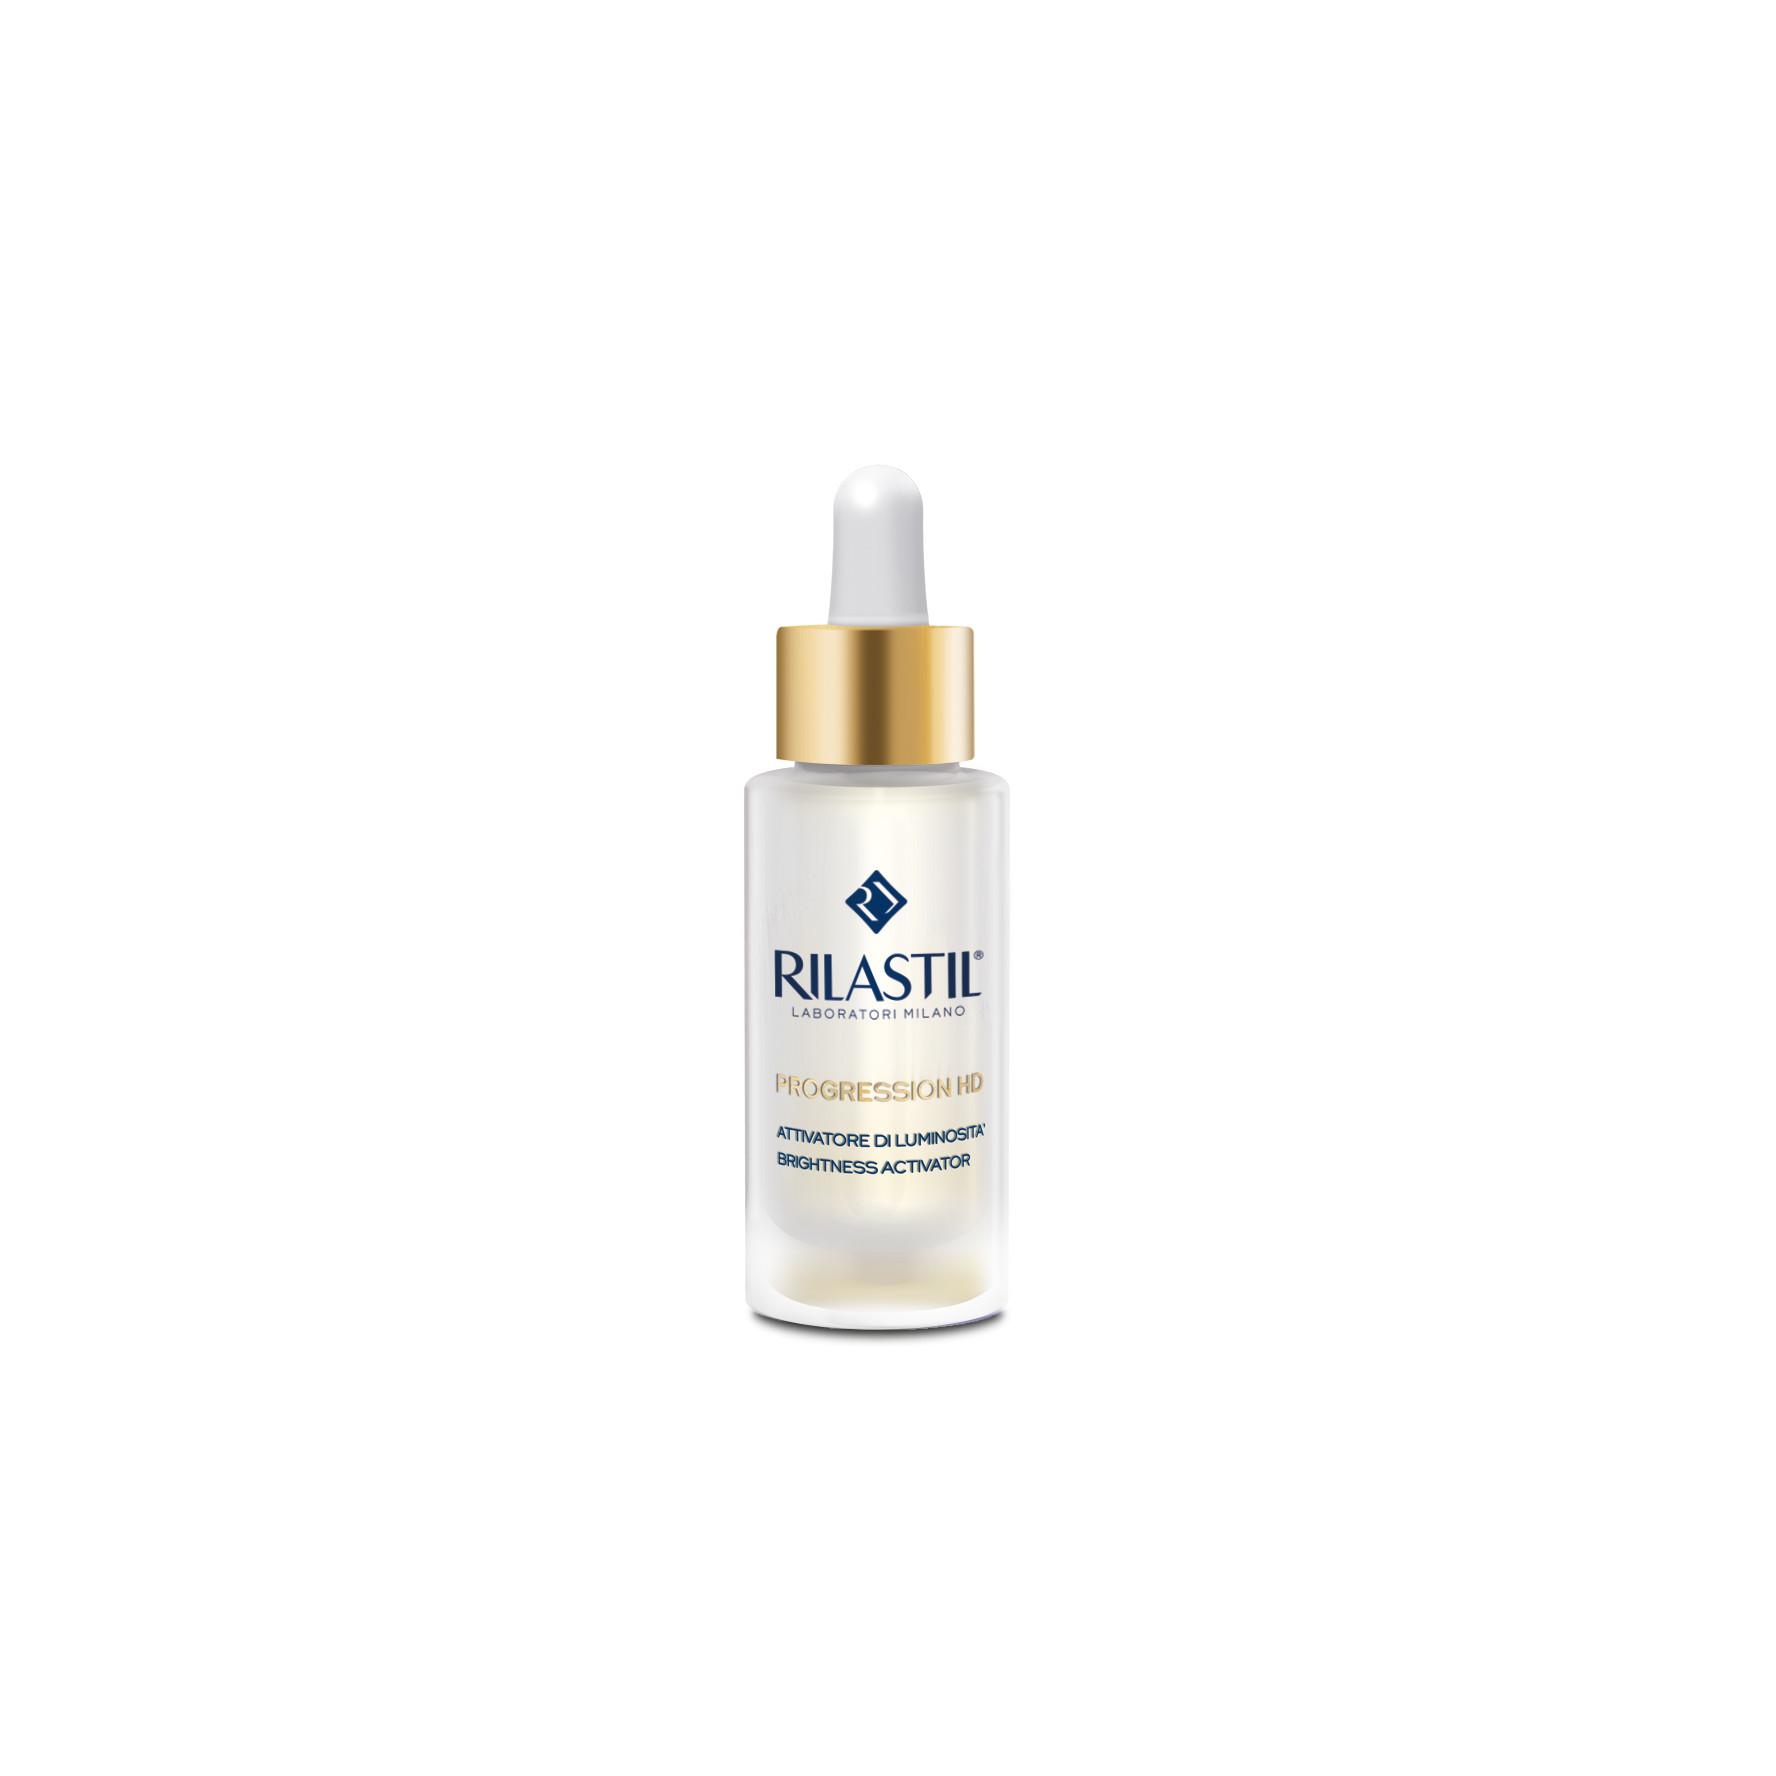 Serum chống lão hóa dưỡng sáng da Rilastil Progression HD Brightness Activator